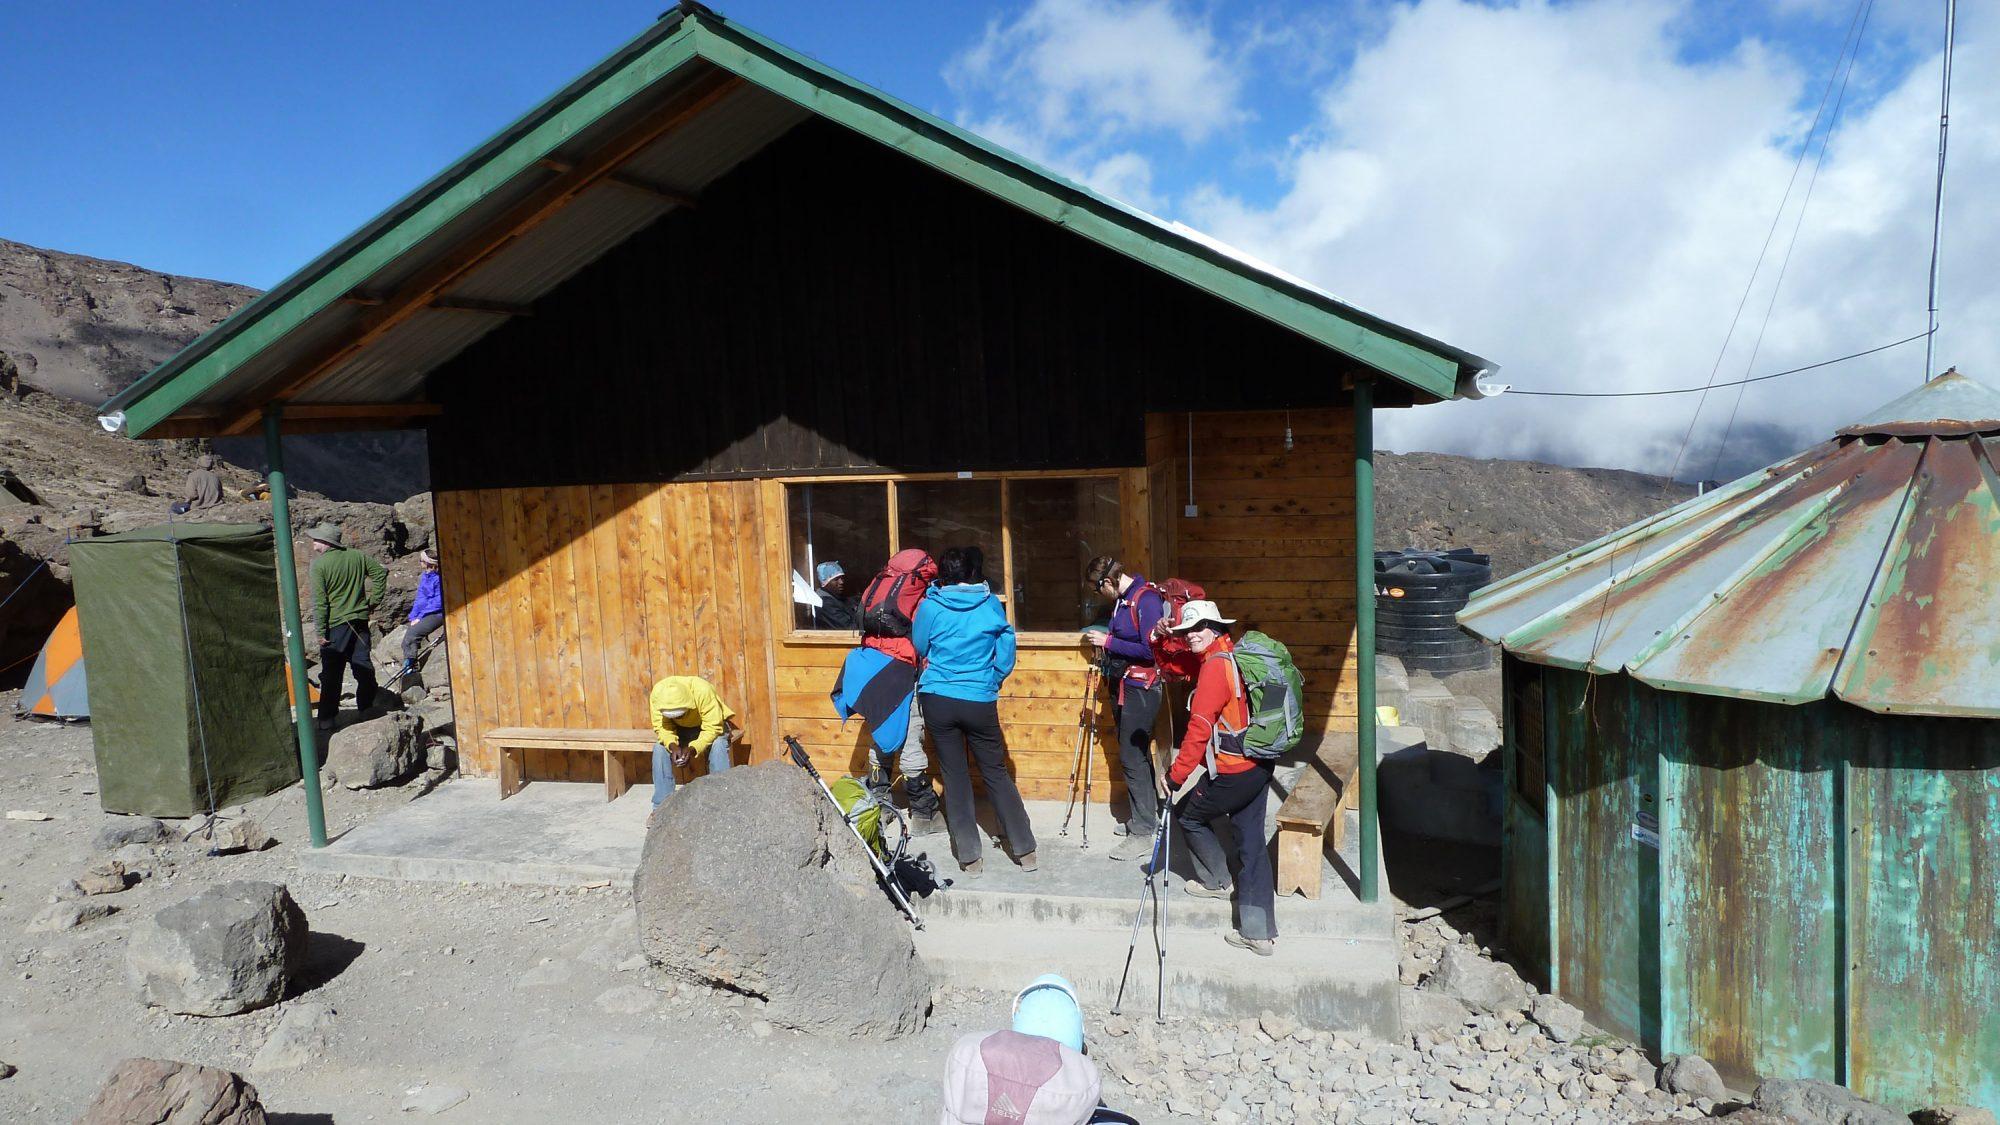 Barafu Camp Check-in, Kilimandscharo, Kilimandscharo besteigen, Tansania, Afrika, Kilimandscharo Tour, Erfahrungsbericht, Machame Route